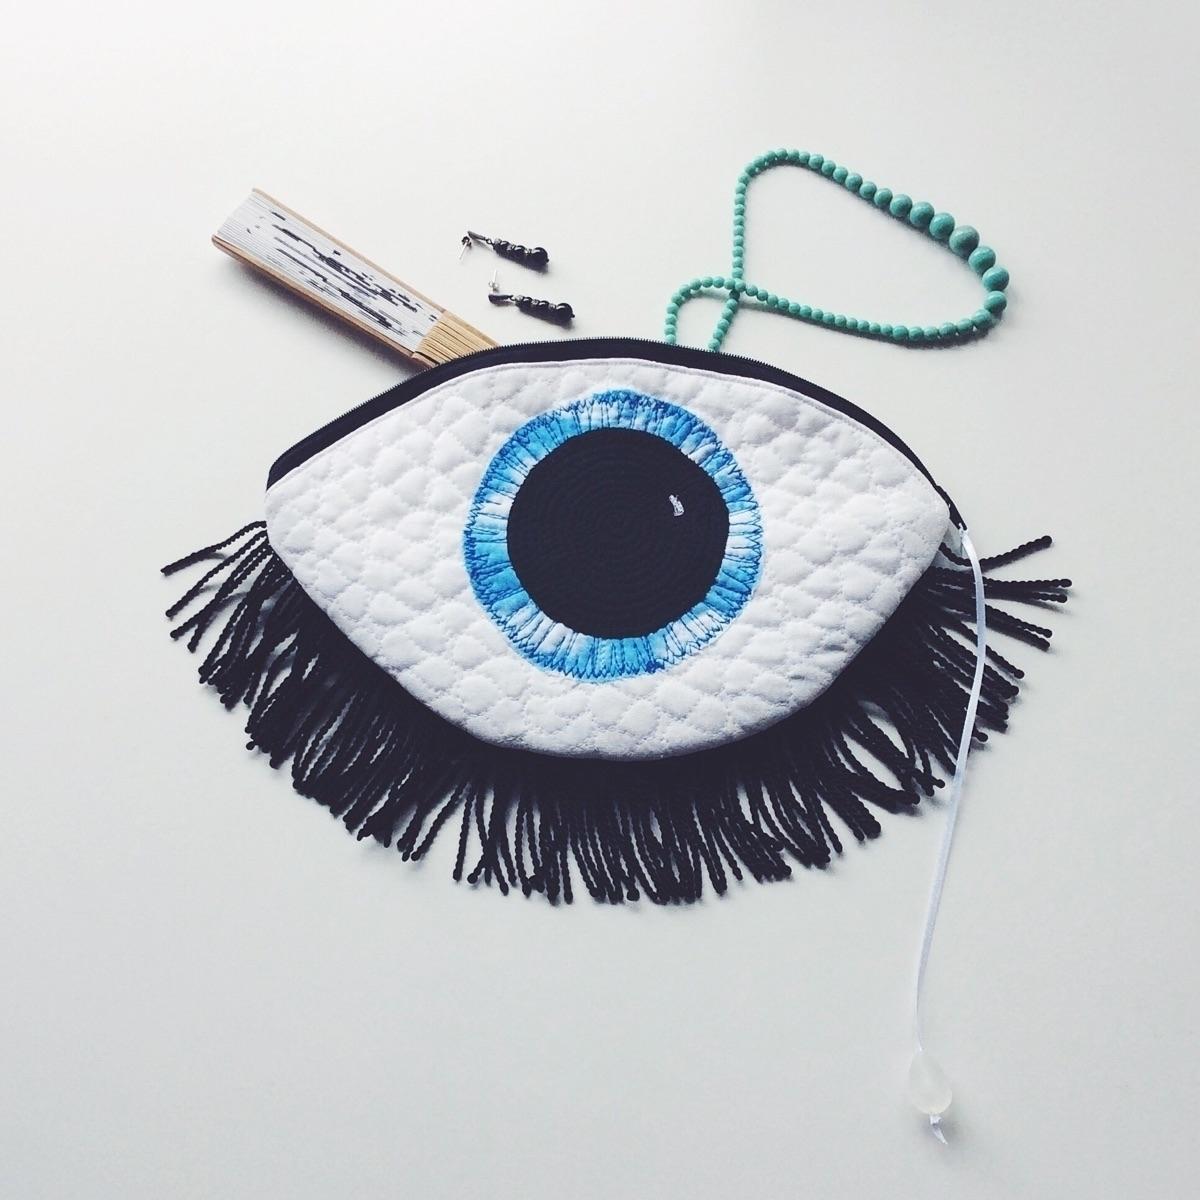 longest lashes eye bag - newinstore - alittlevintagedoll | ello